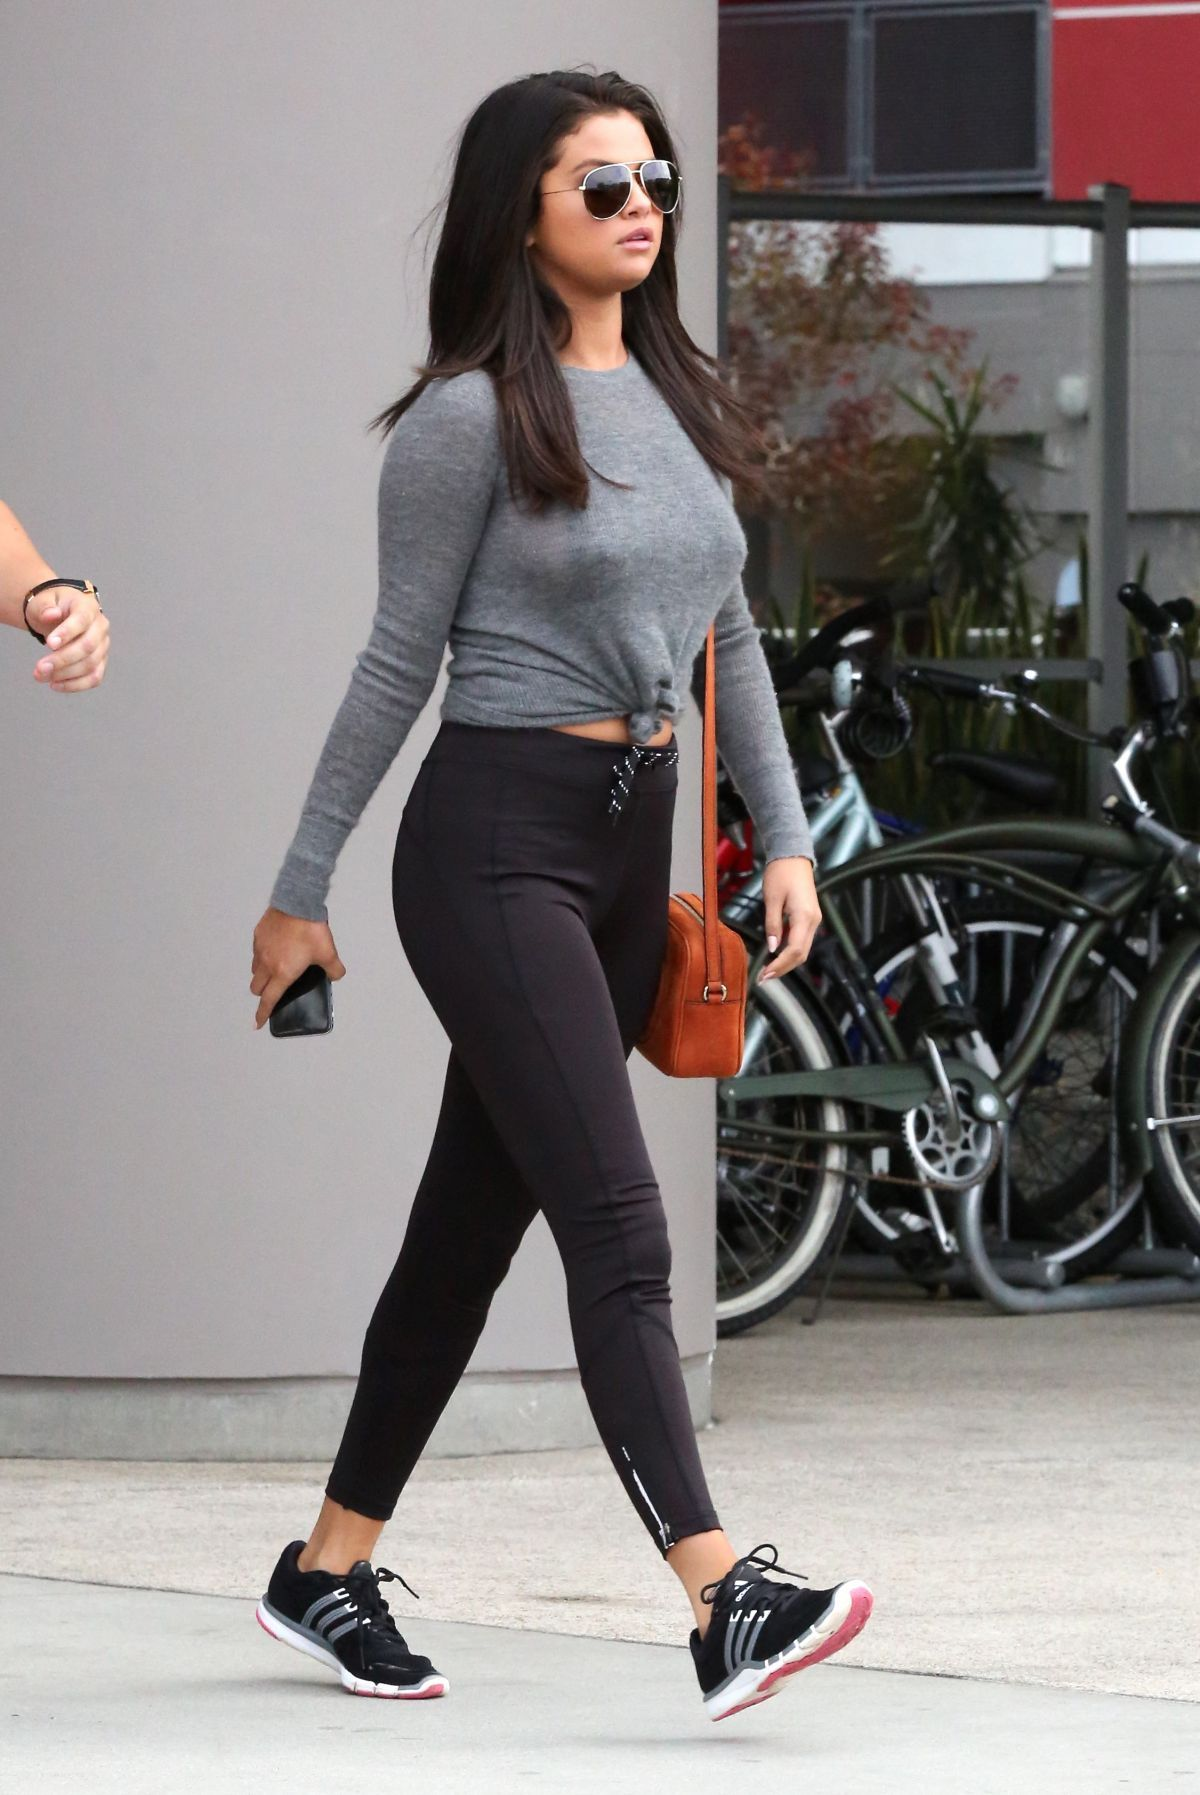 2019 year lifestyle- Gomez selena casual outfits tumblr photo